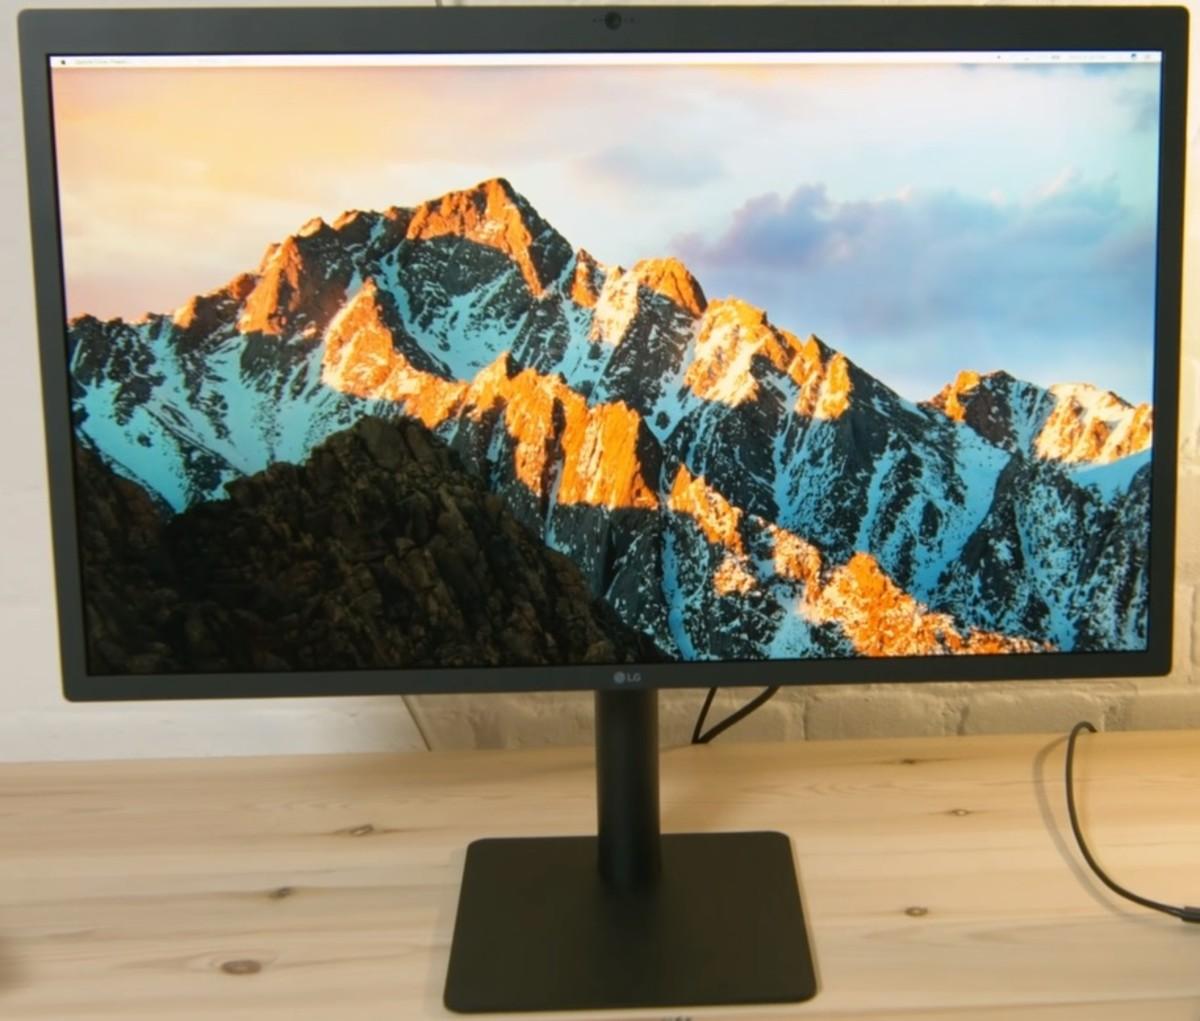 8 Best USB-C Monitors for Apple MacBook Pro and Mini 2019